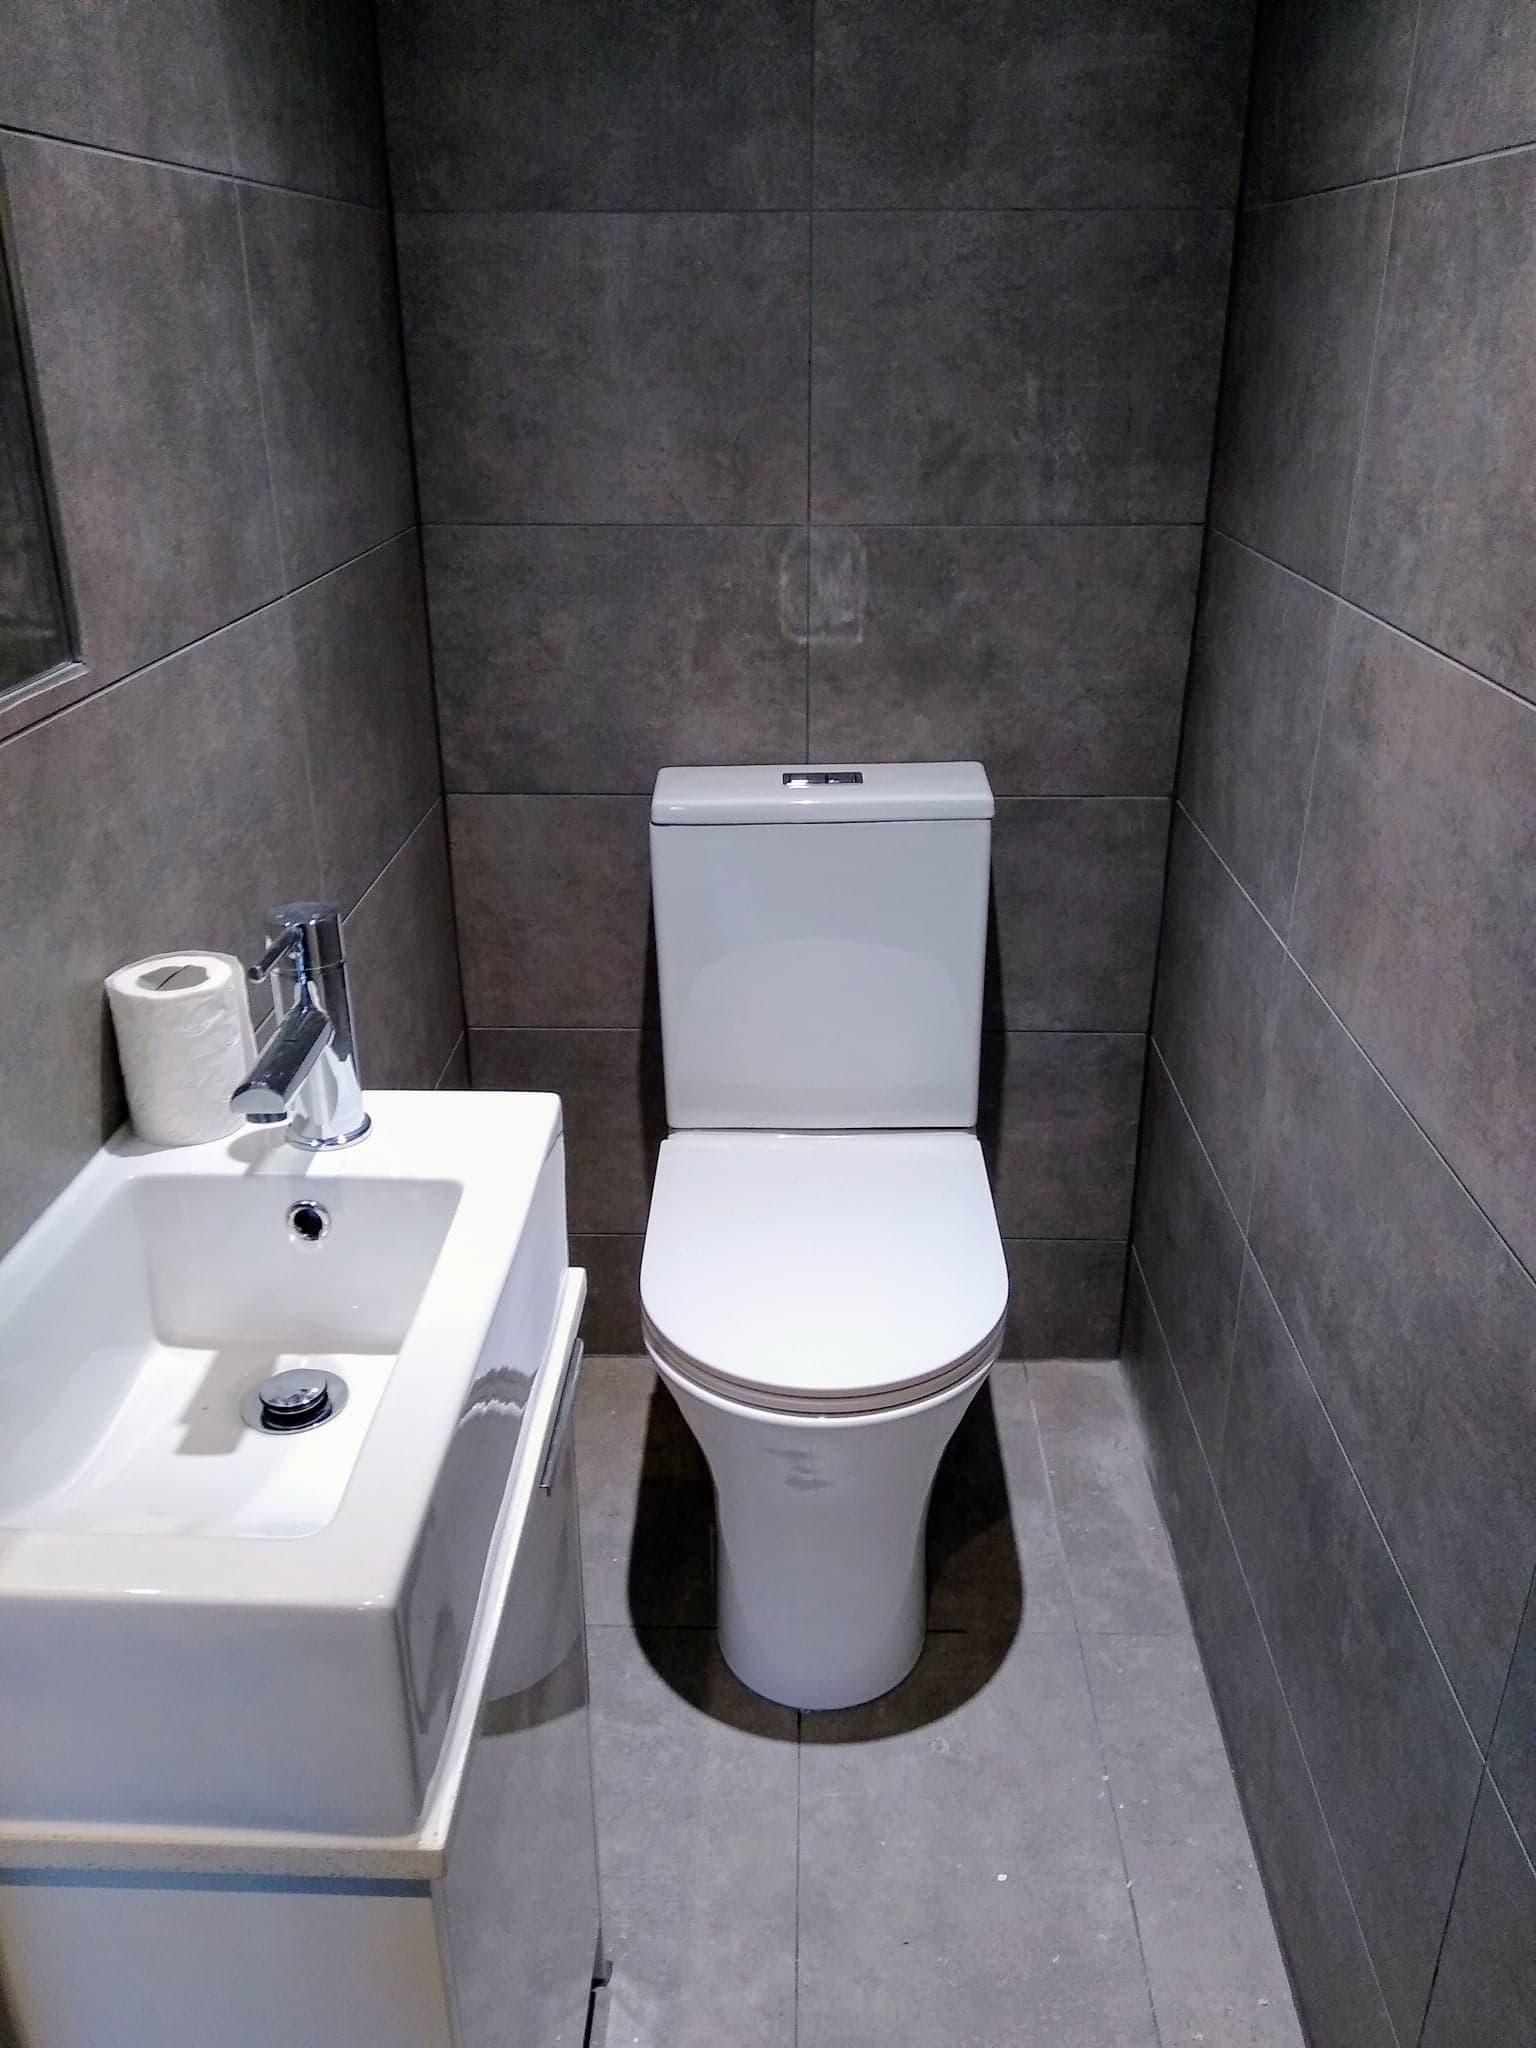 leaking toilets repair melbourne